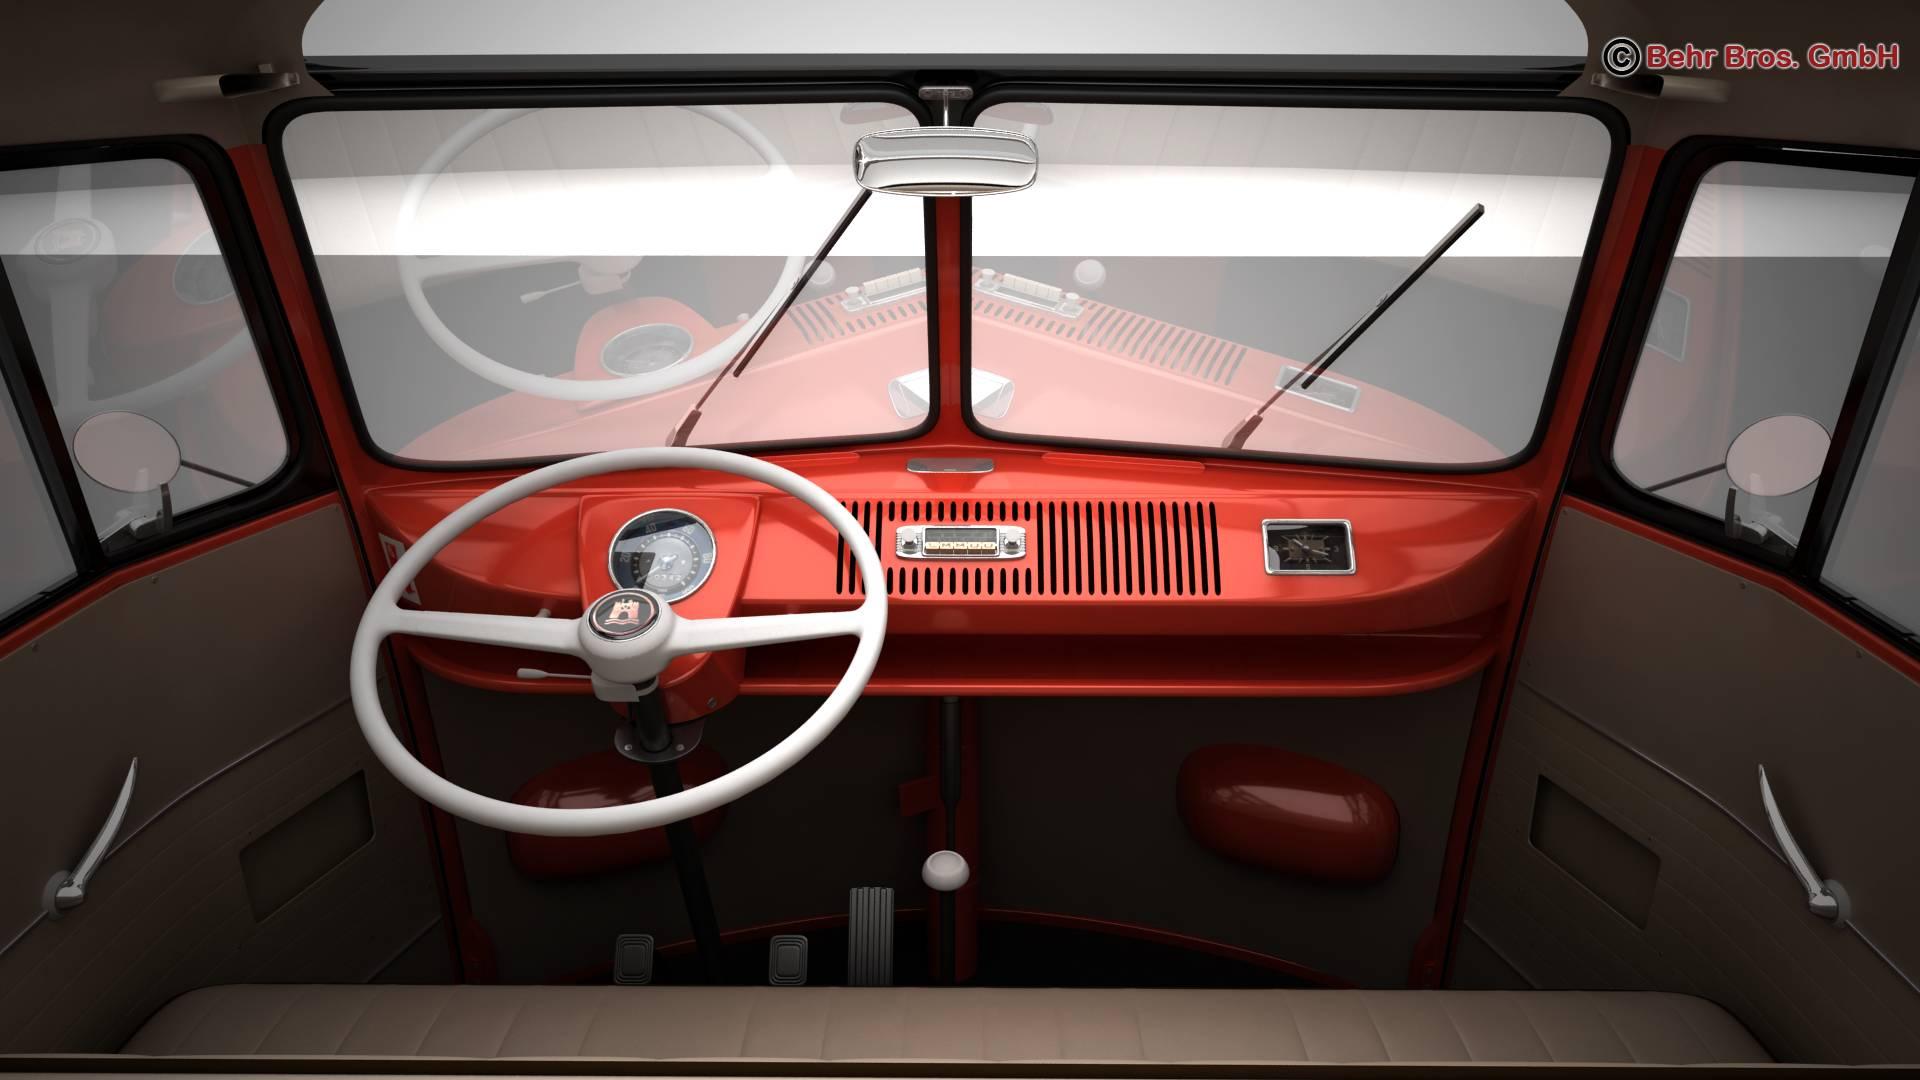 volkswagen type 2 samba 1959 3d model 3ds max fbx c4d lwo ma mb obj 217118